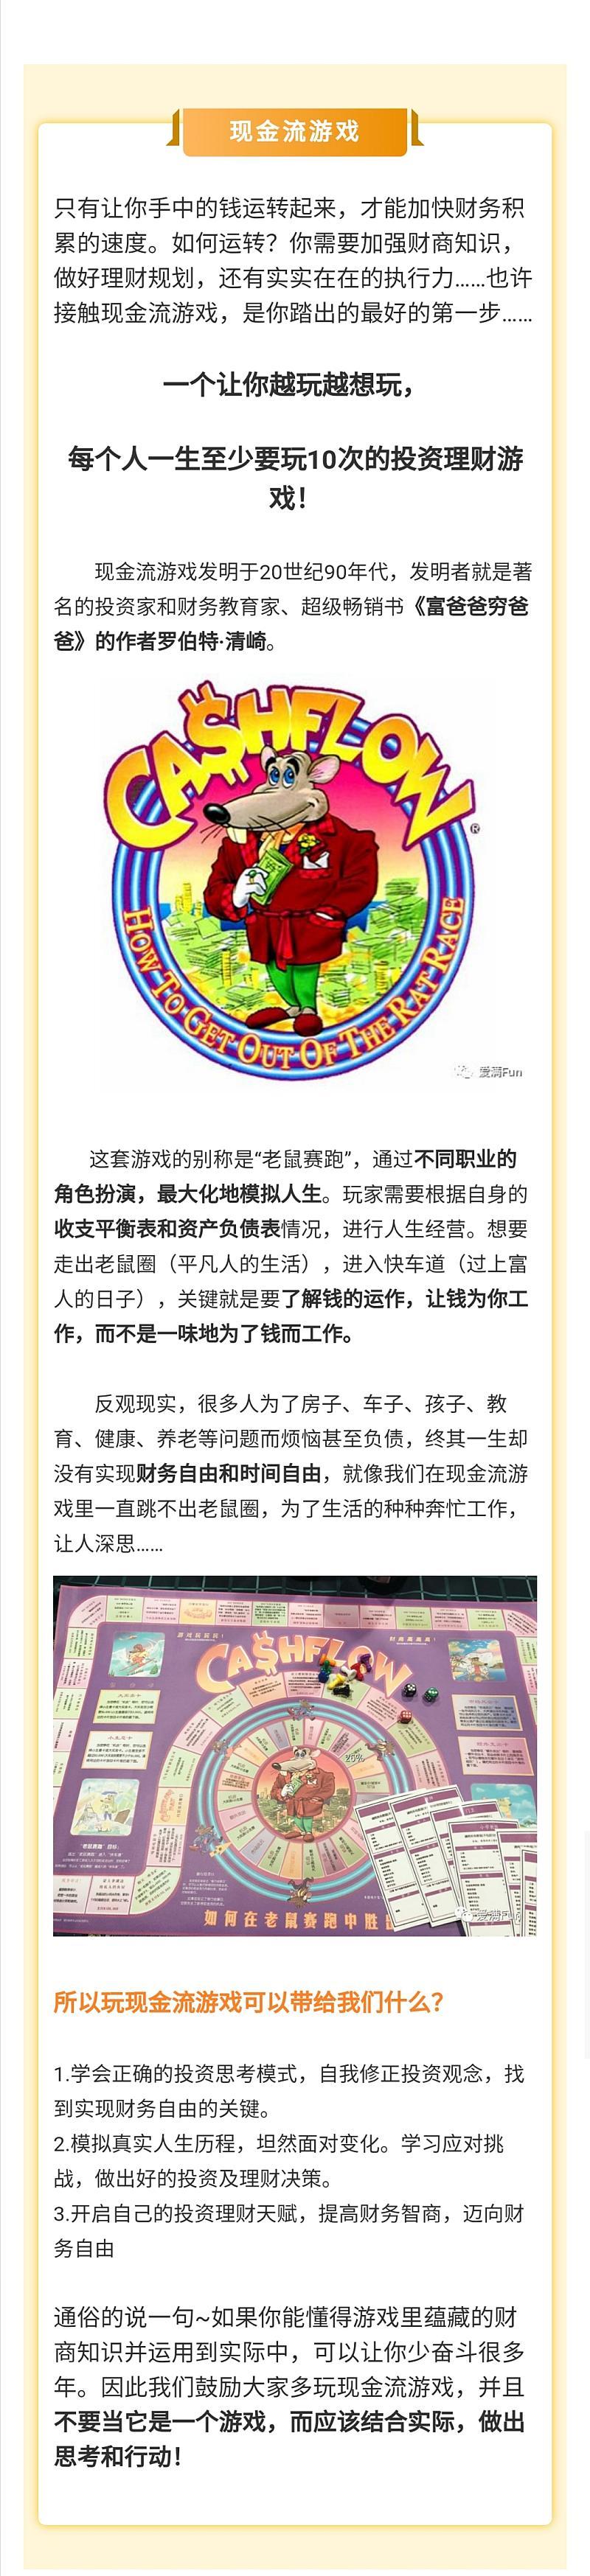 http://www.huodongxing.com/file/20191107/1653597577874/104303090943427.jpeg